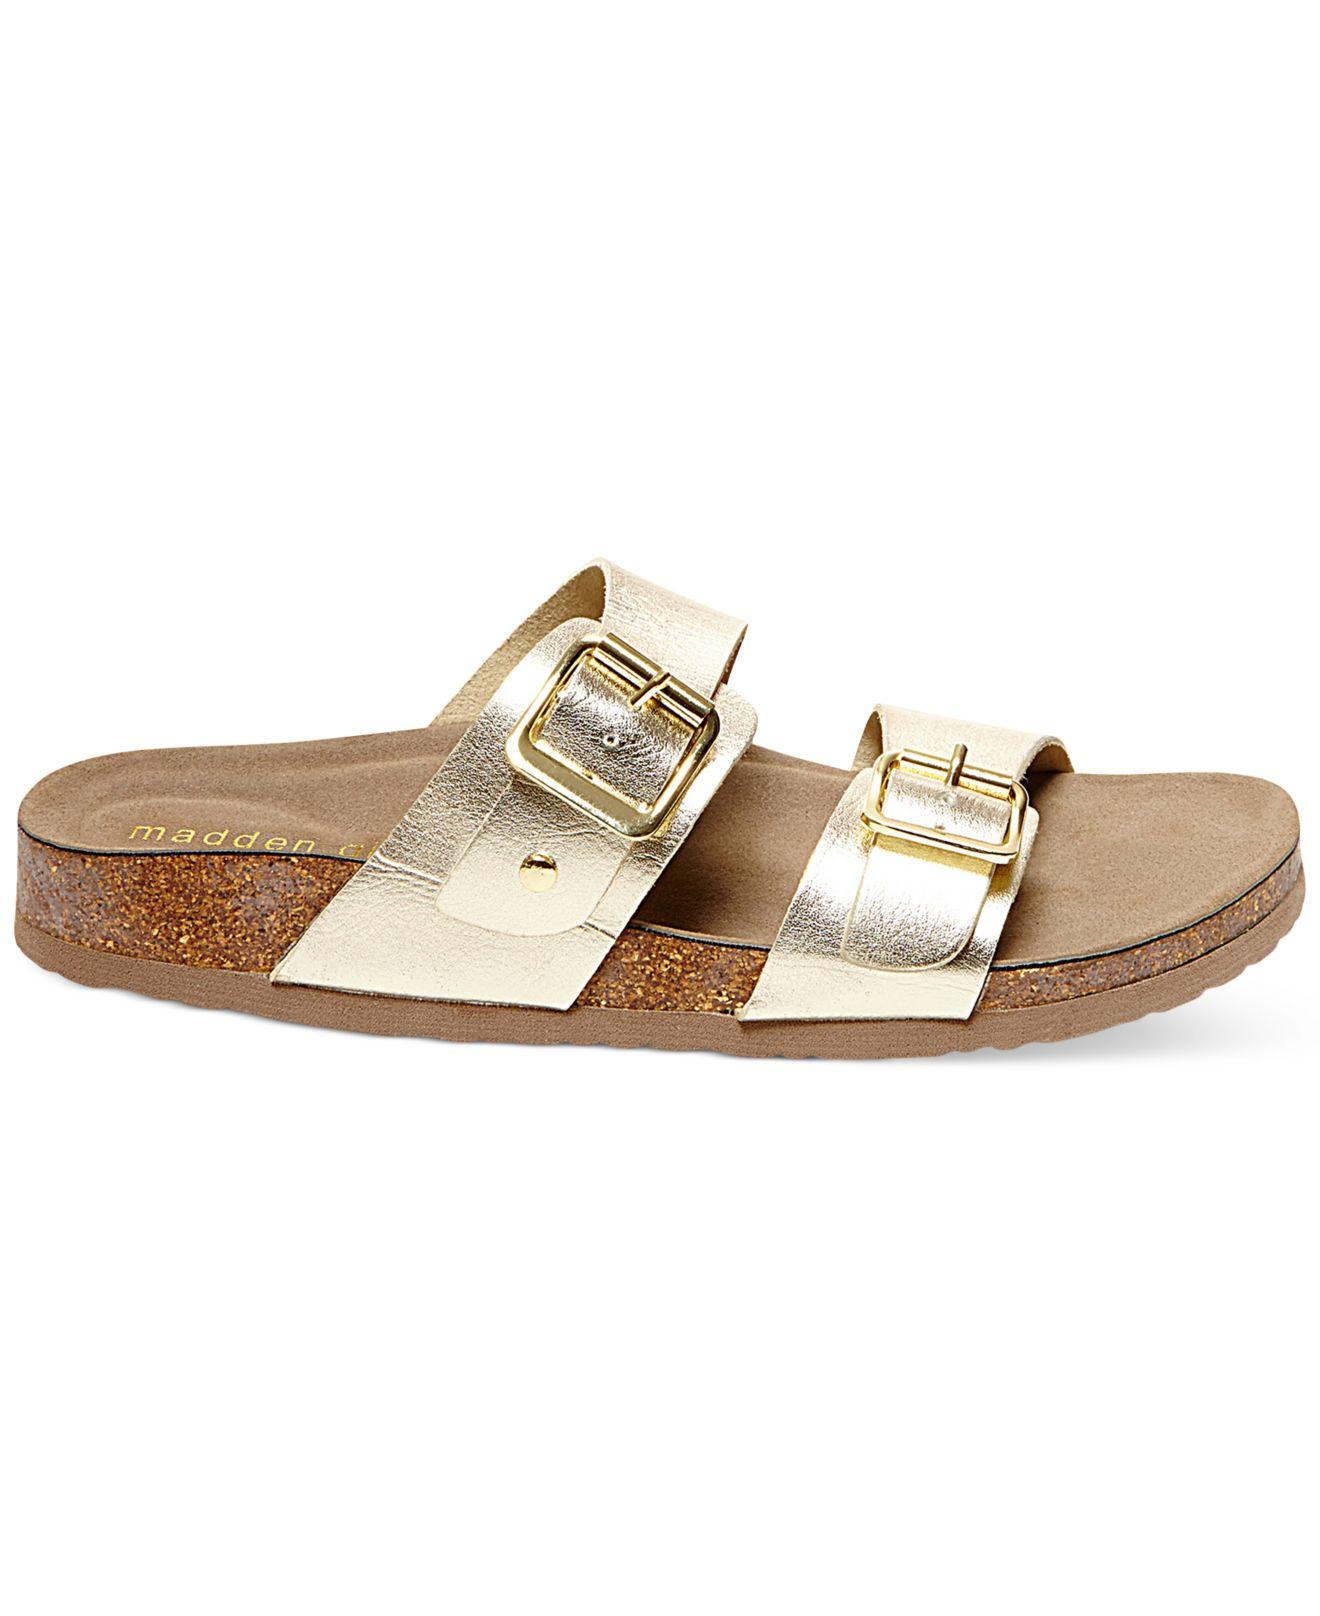 638f6abb099f Lyst - Madden Girl Brando Footbed Sandals in Metallic